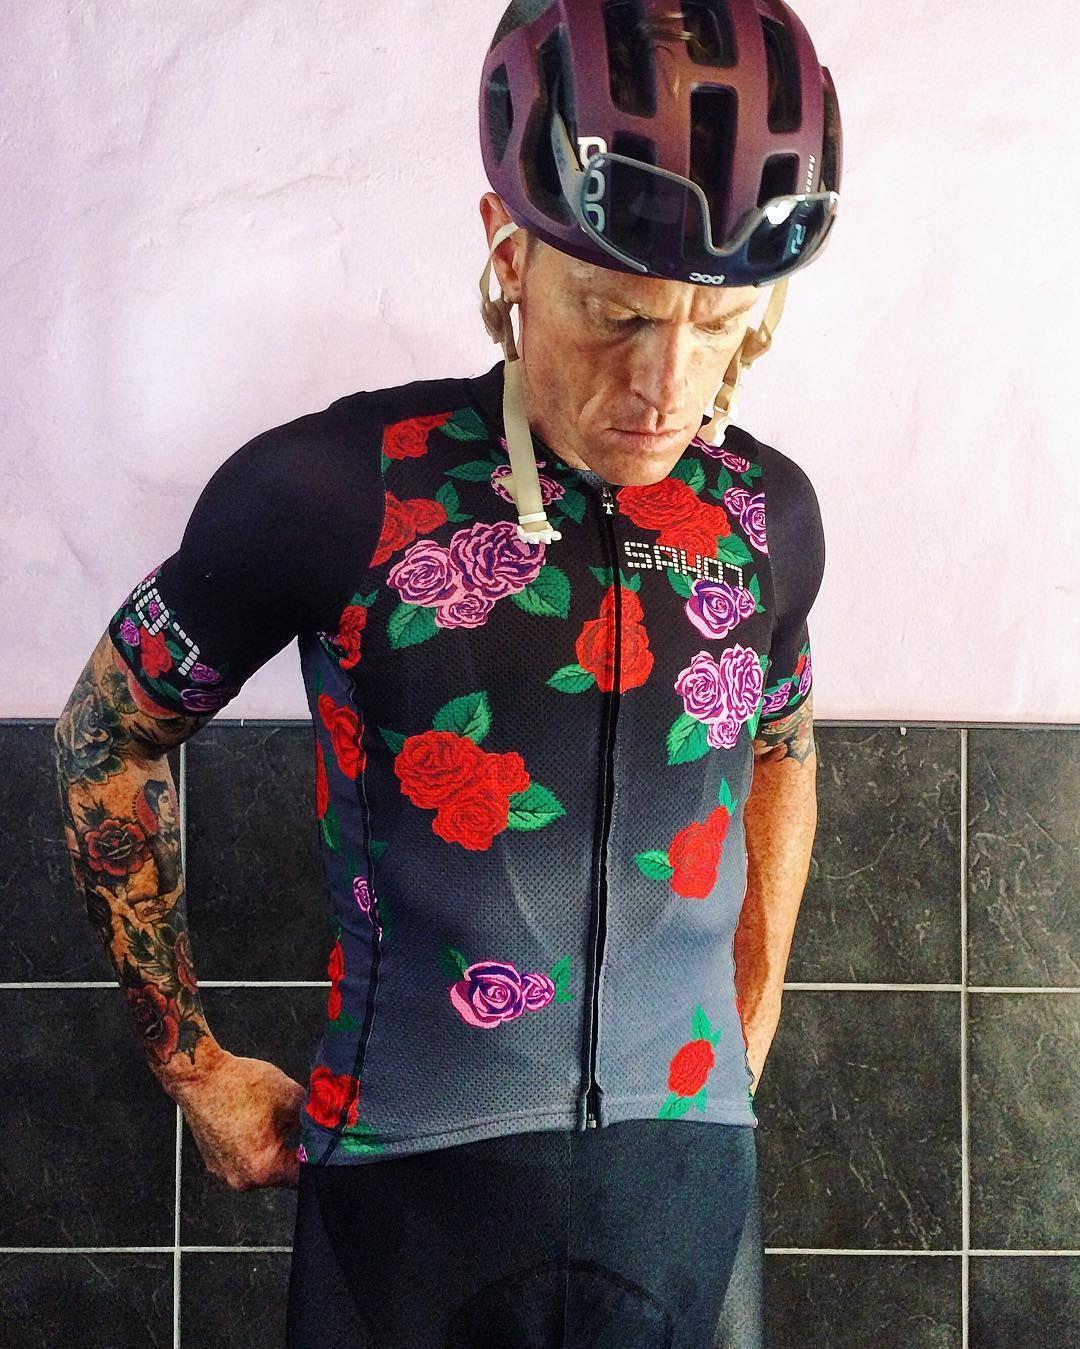 Roses are blooming out of my chest.  #sako7socks | #sako7kit #pocsports | #poc | #bioracer by sean_sako